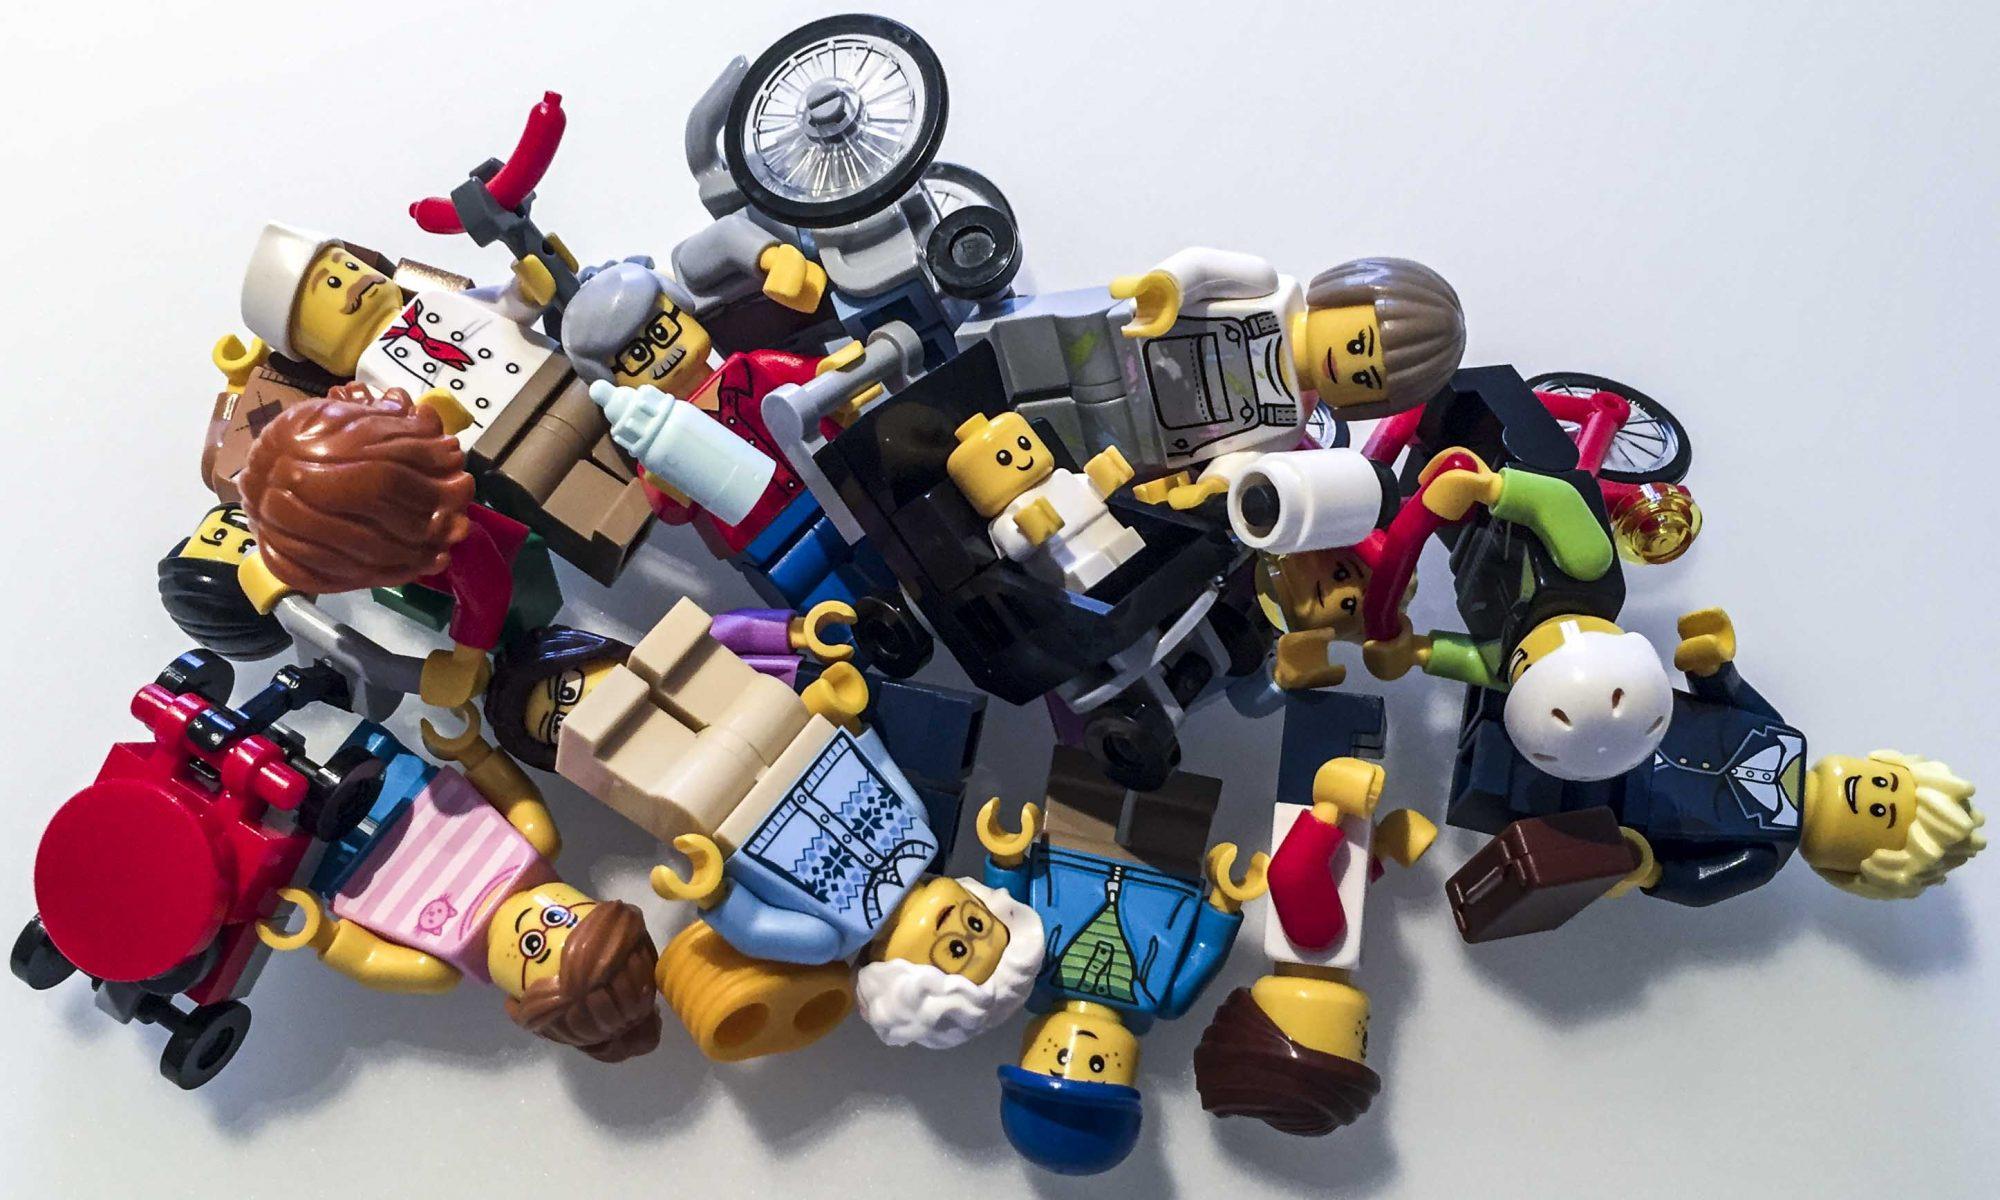 self-organiziational chaos